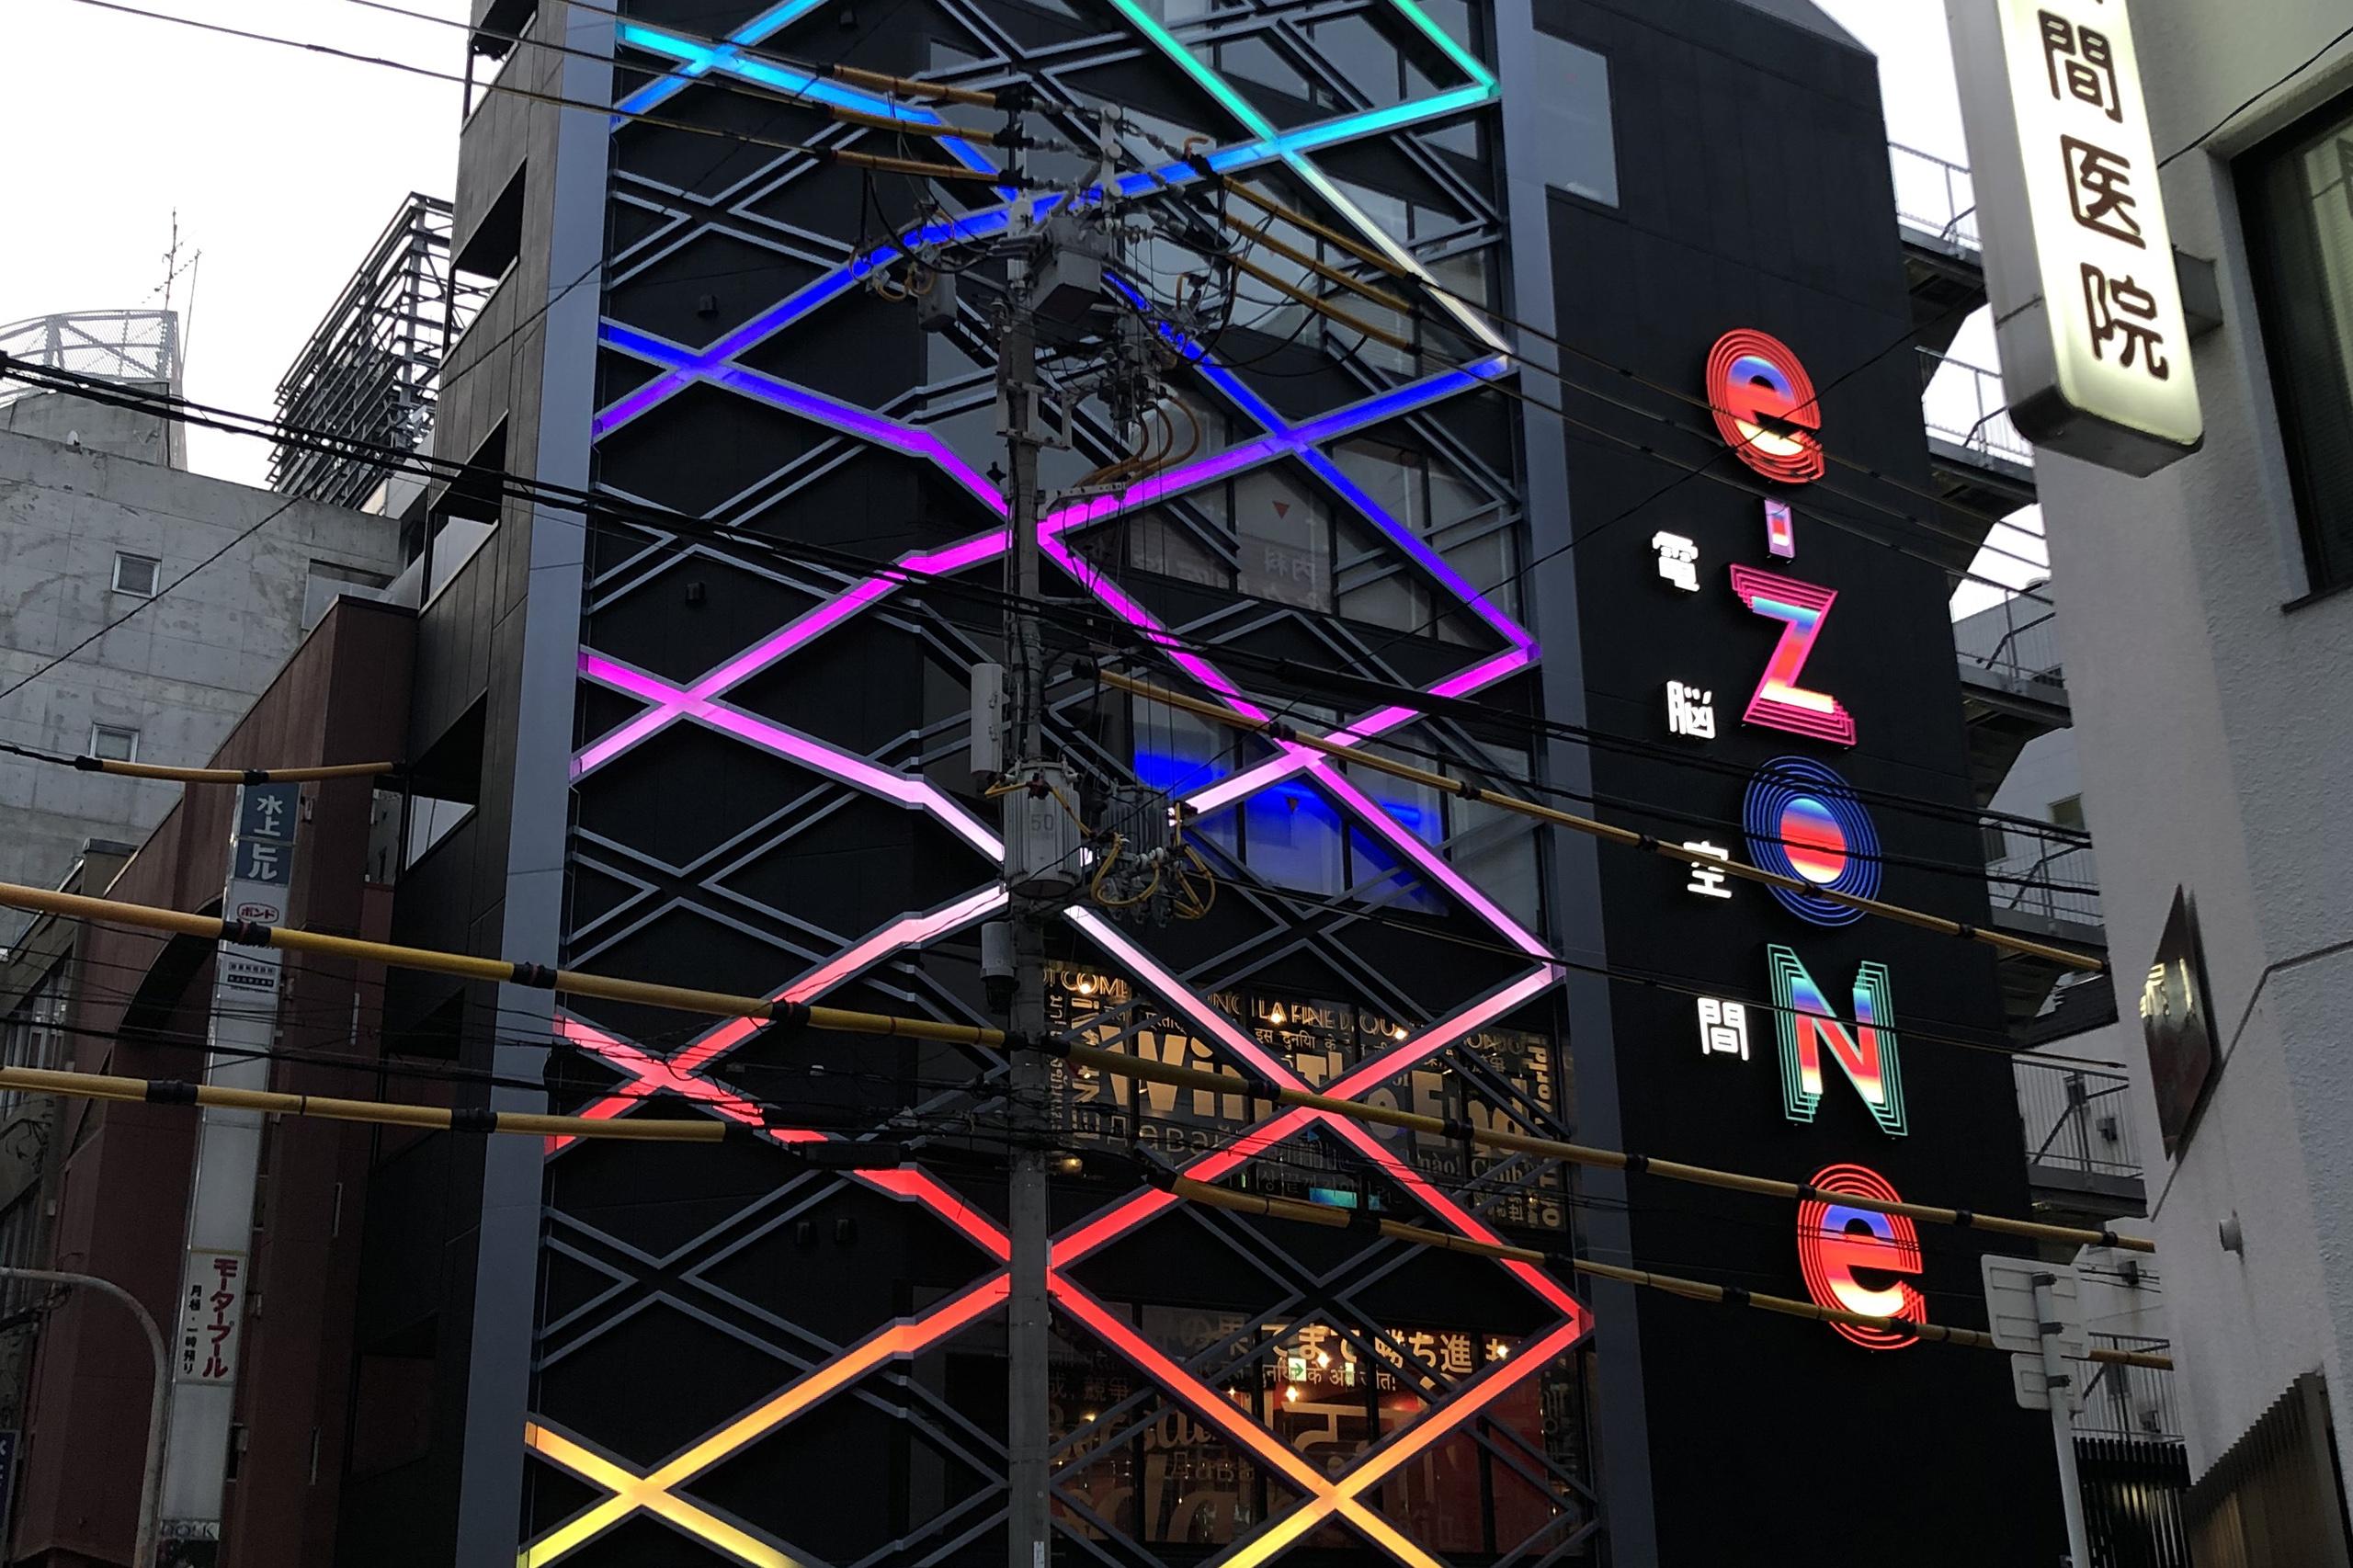 esports hotel e-ZONe 電脳空間様